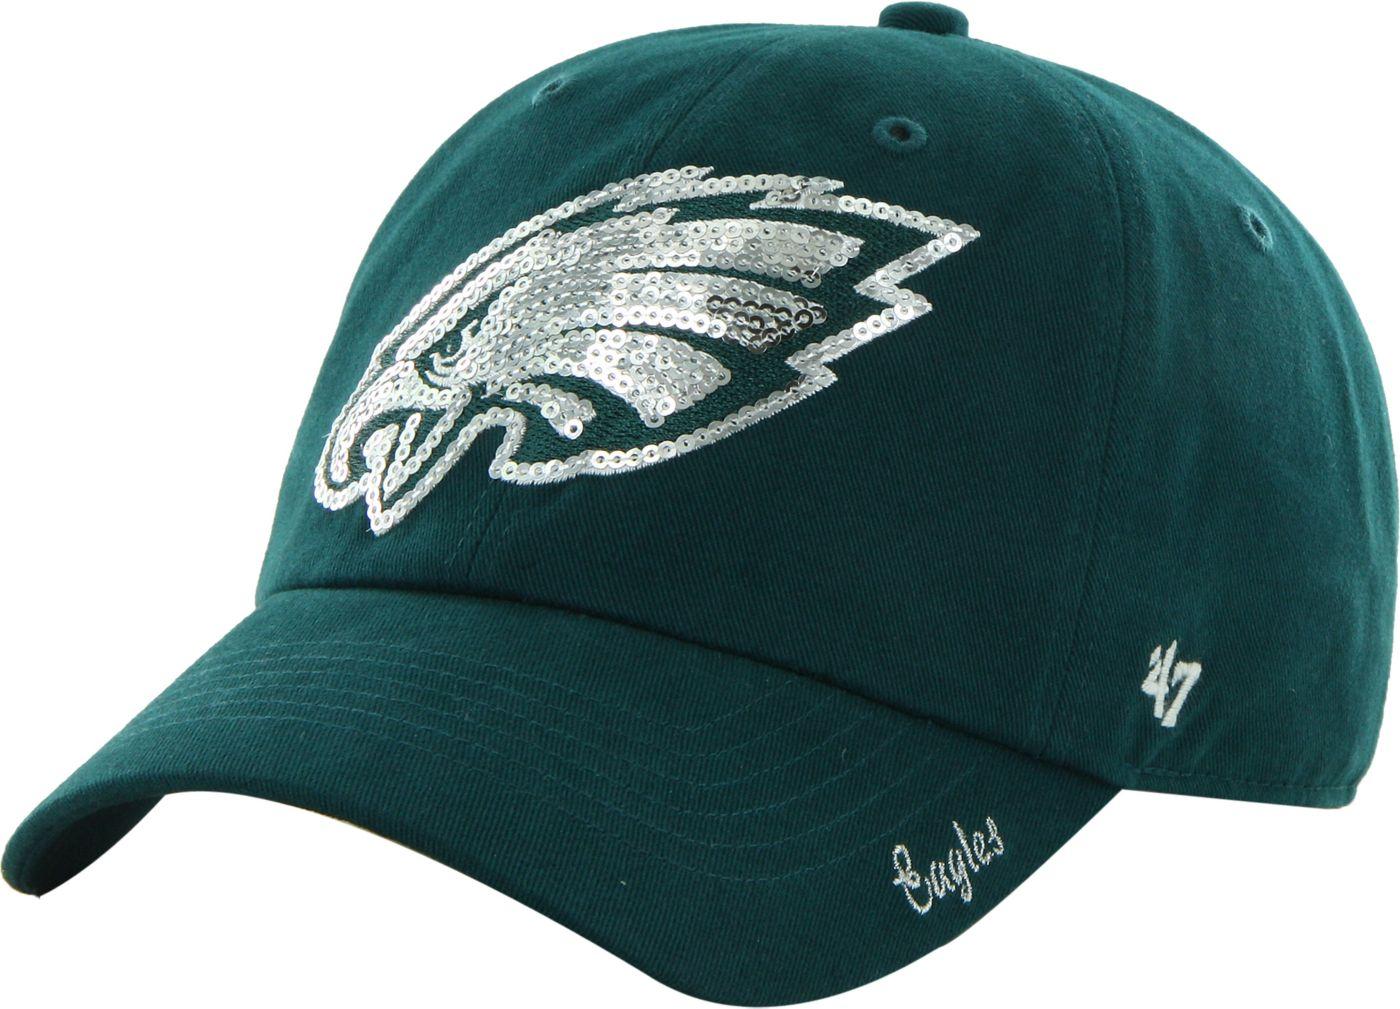 '47 Women's Philadelphia Eagles Sparkle Adjustable Green Hat